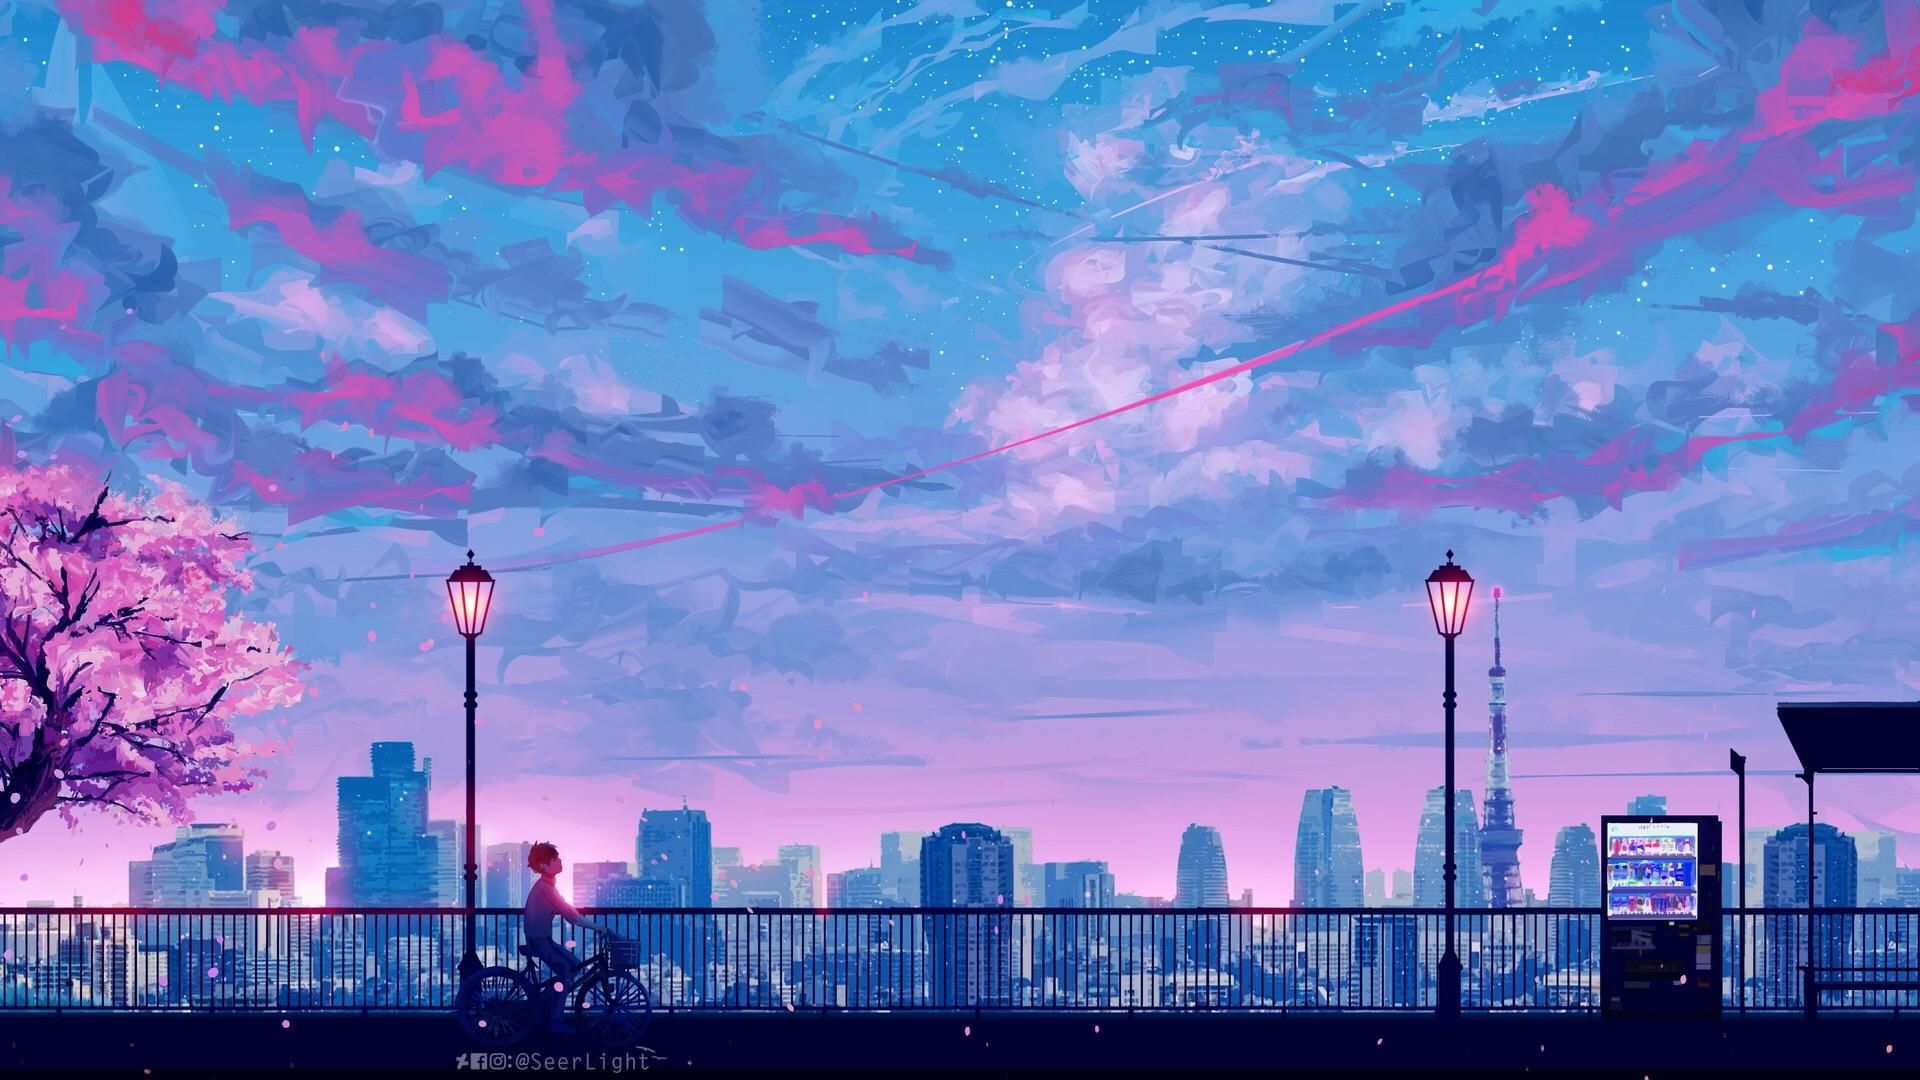 1920 X 1080 Anime City Landscape Cityscape Wallpaper Desktop Wallpaper Art Scenery Wallpaper